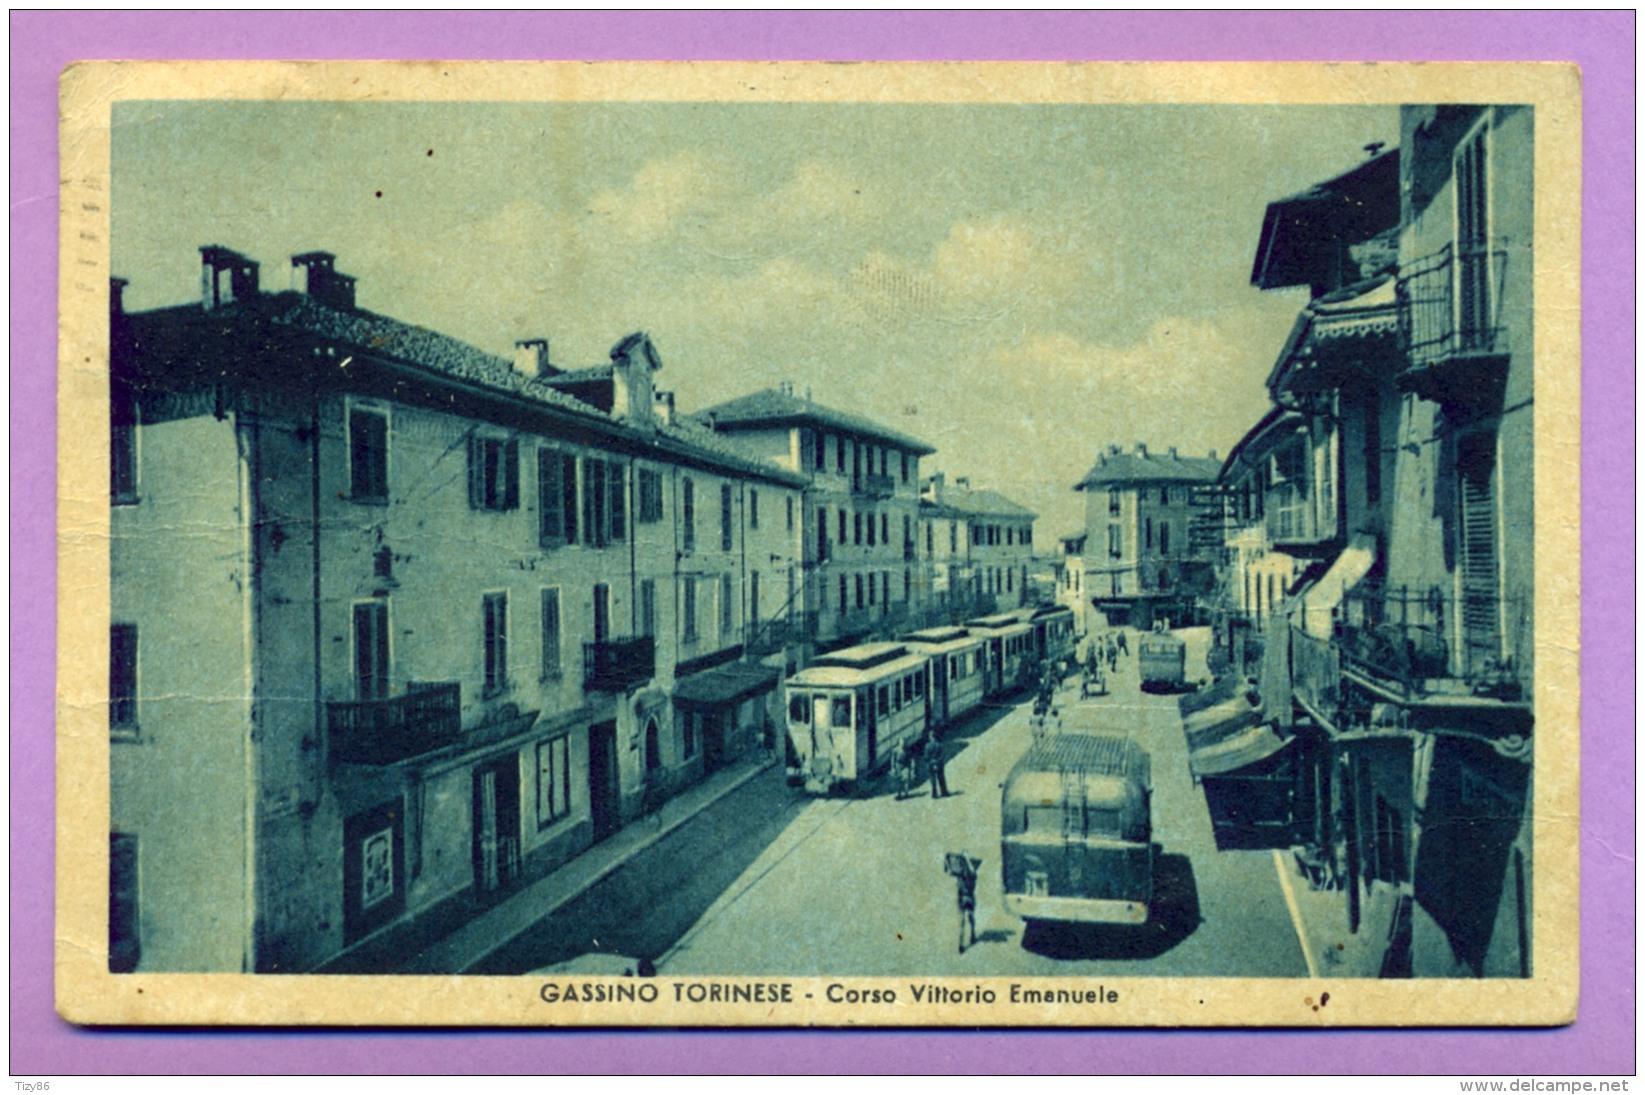 Gassino Torinese - Corso Vittorio Emanuele - Italy